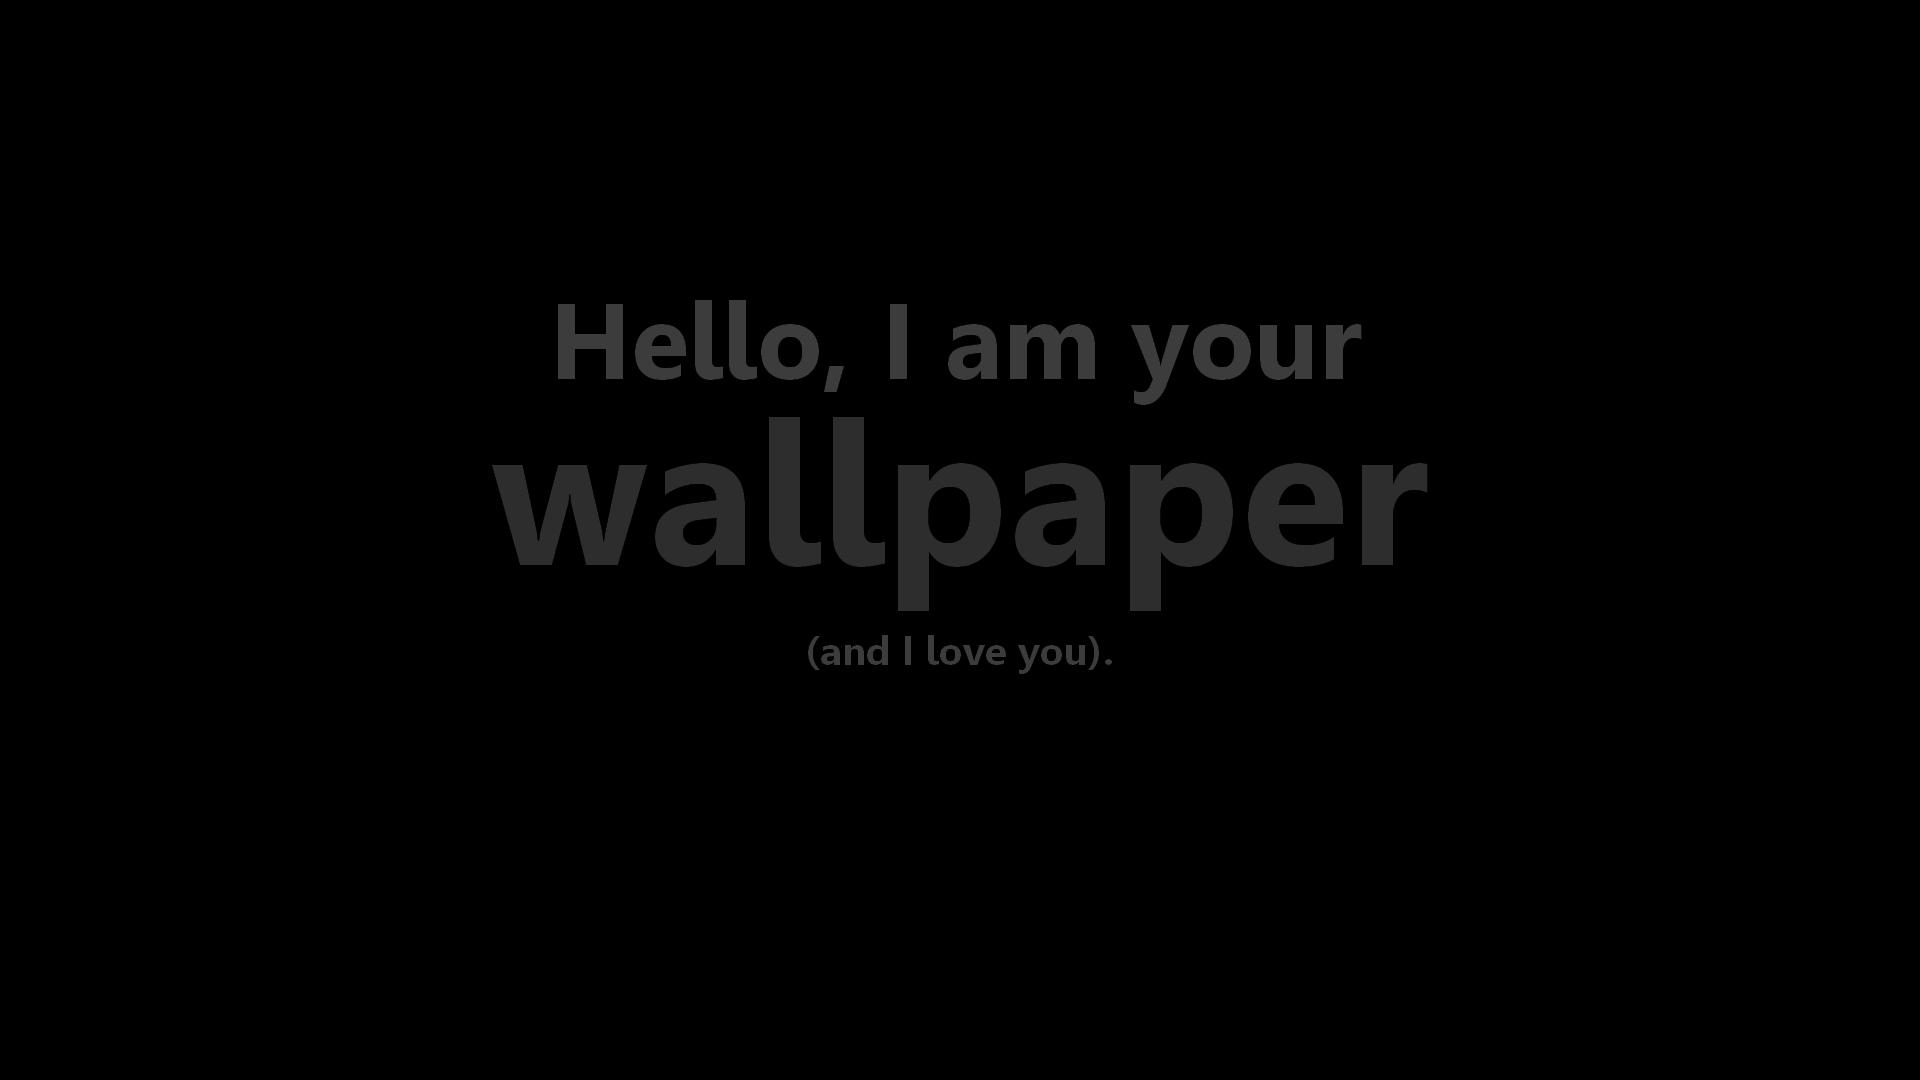 I Am Back Wallpaper Free Download: Hello I Am Your Wallpaper